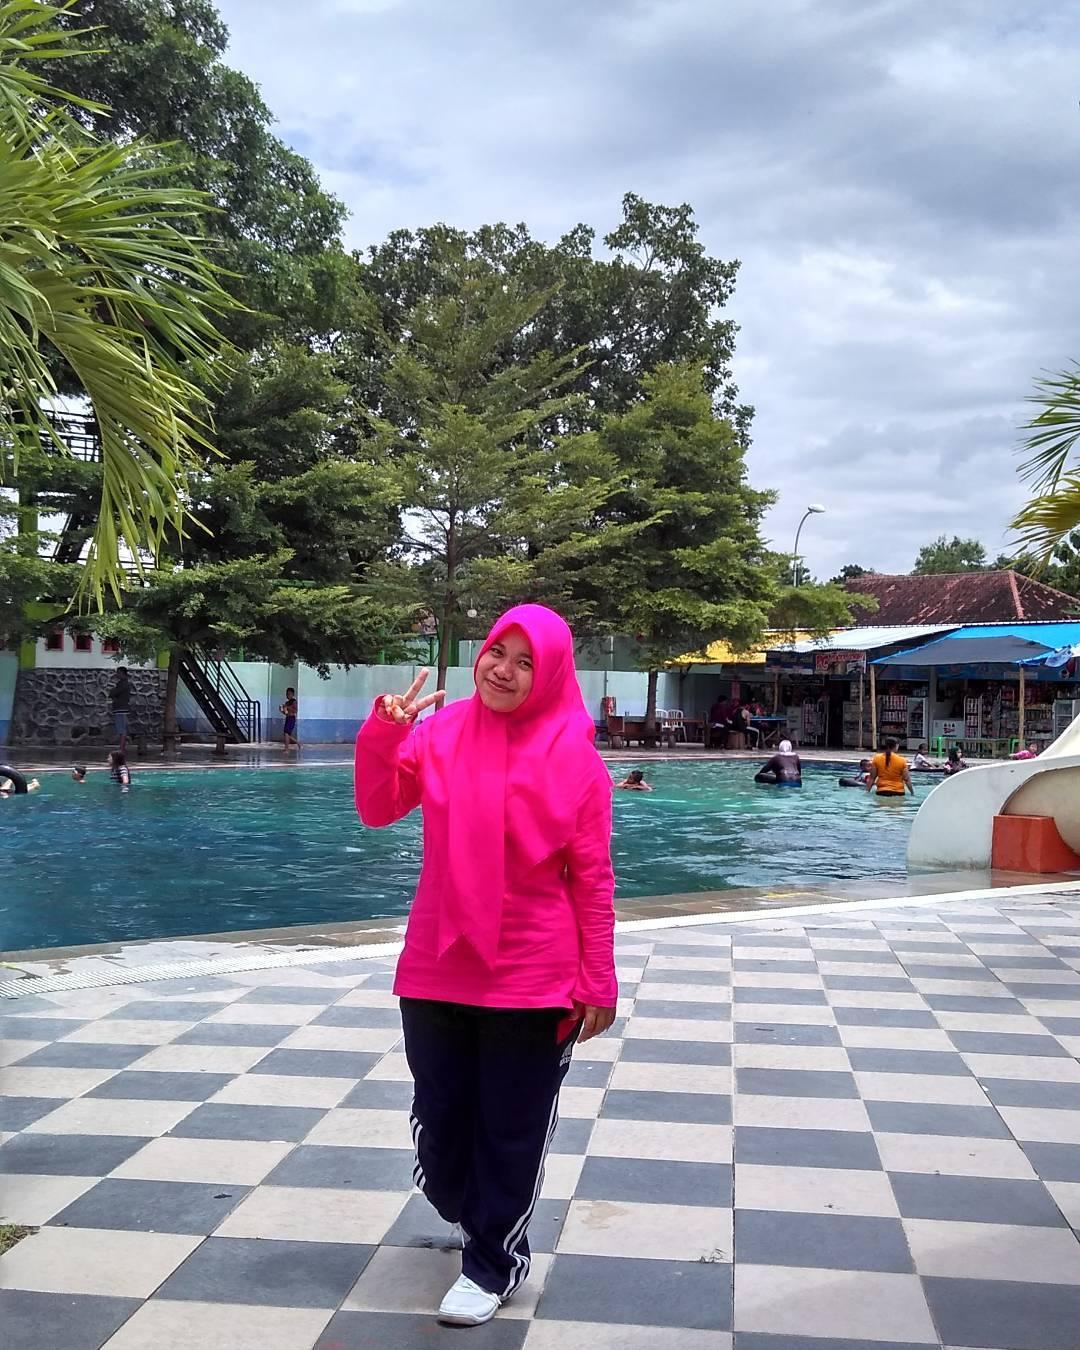 Tempat Wisata Madiun Hits 2018 Taman Umbul Situs Bersejarah Nglambangan